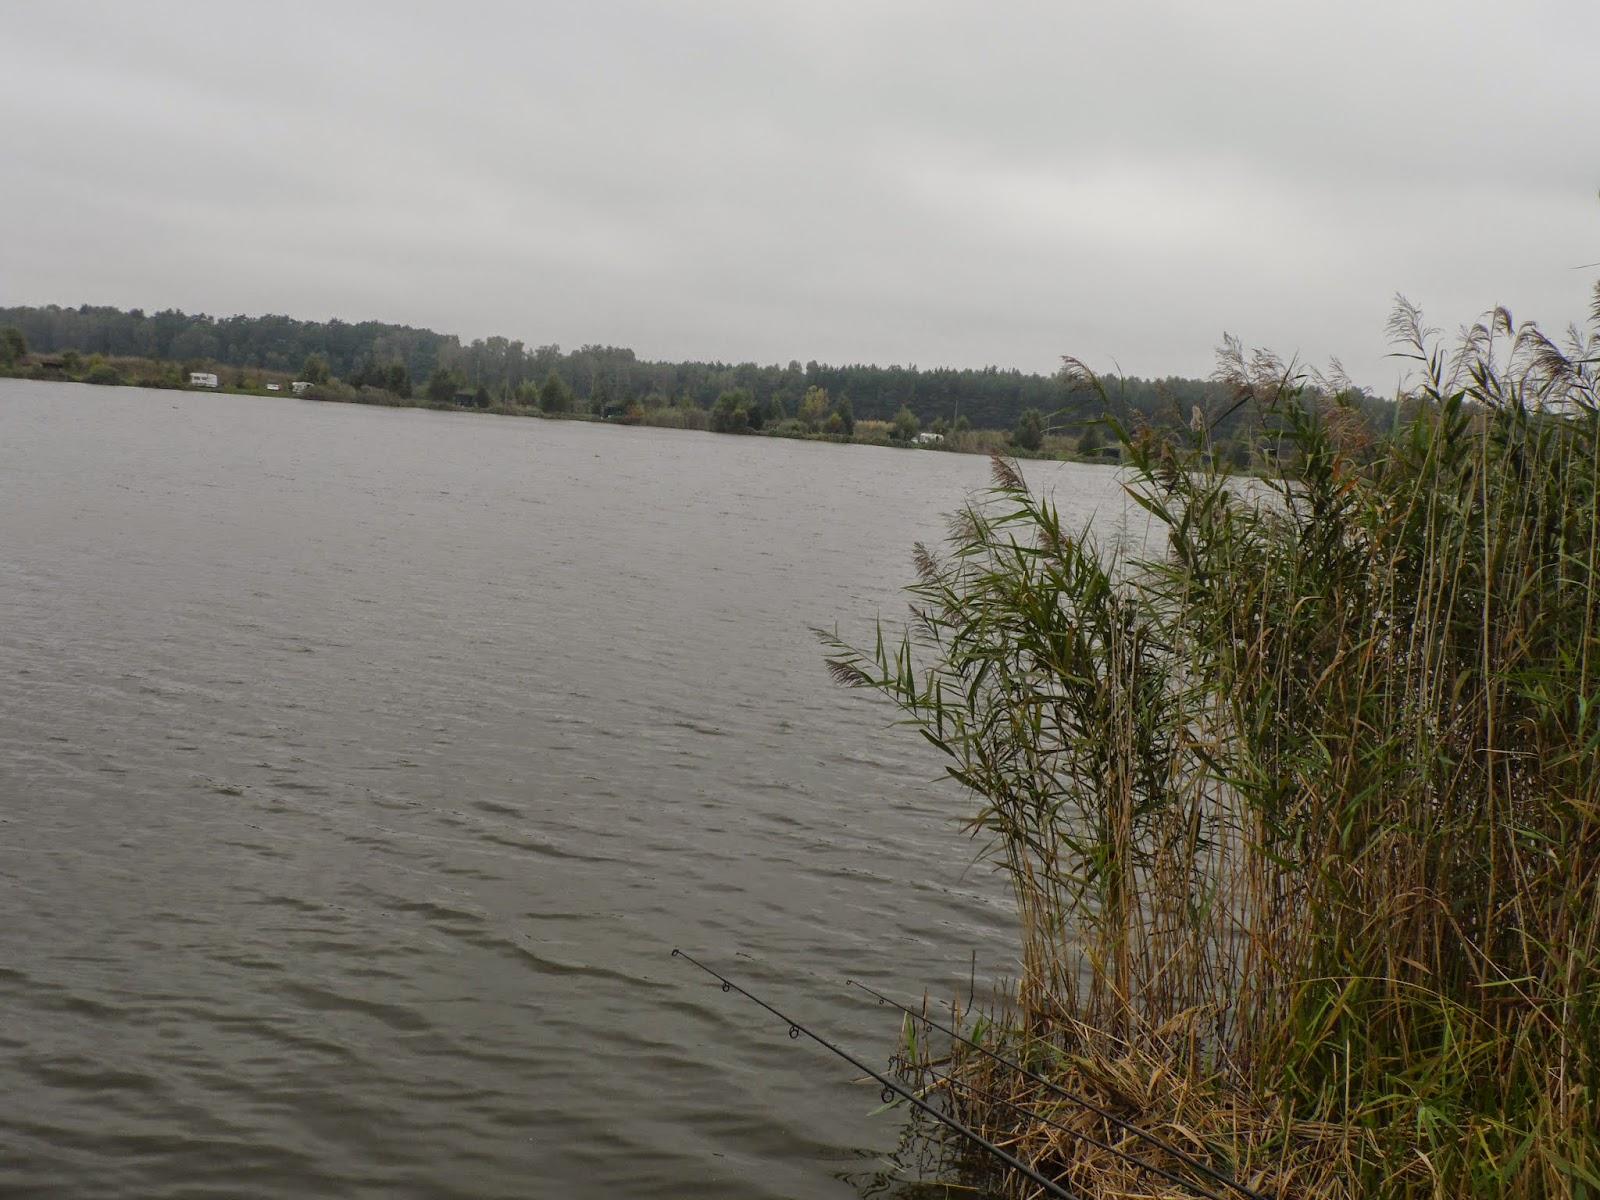 http://carpfishing98.blogspot.com/2014/09/wrzesniowa-zasiadka-na-jarosawkach-12.html